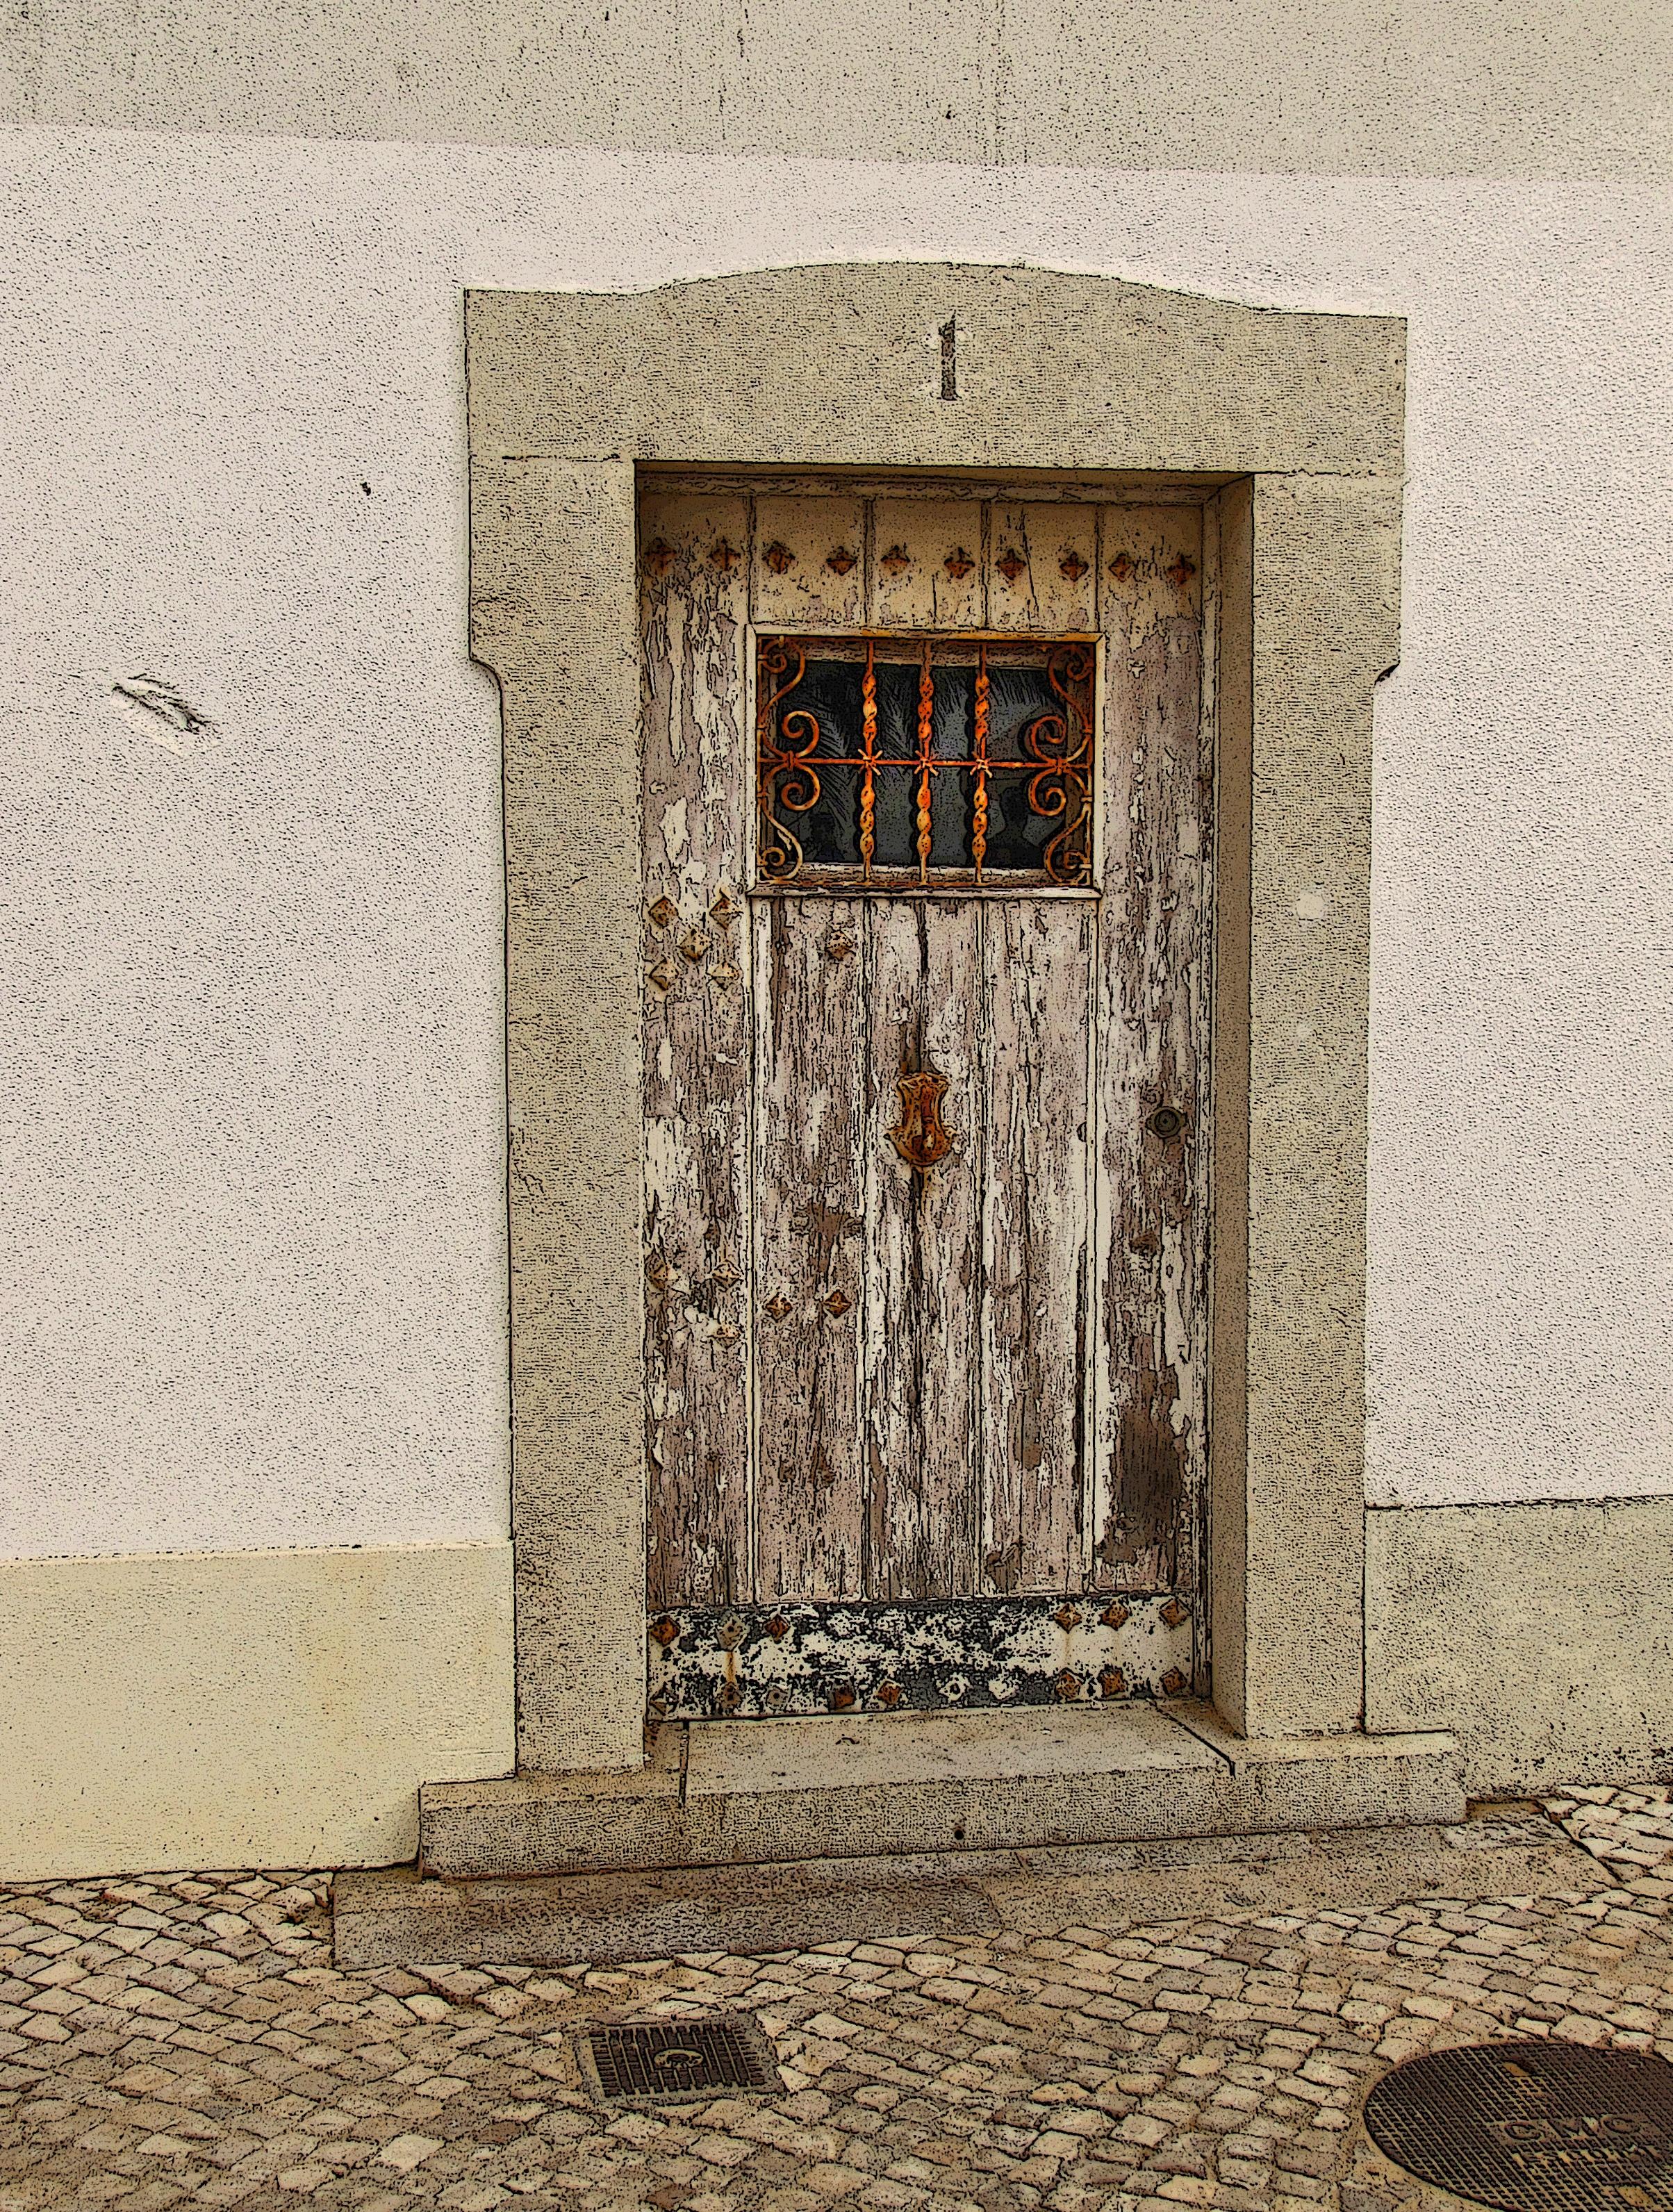 madera calle ventana edificio ciudad columna fachada capilla ladrillo puerta reja alojamiento casa antigua templo portugal estilo casa